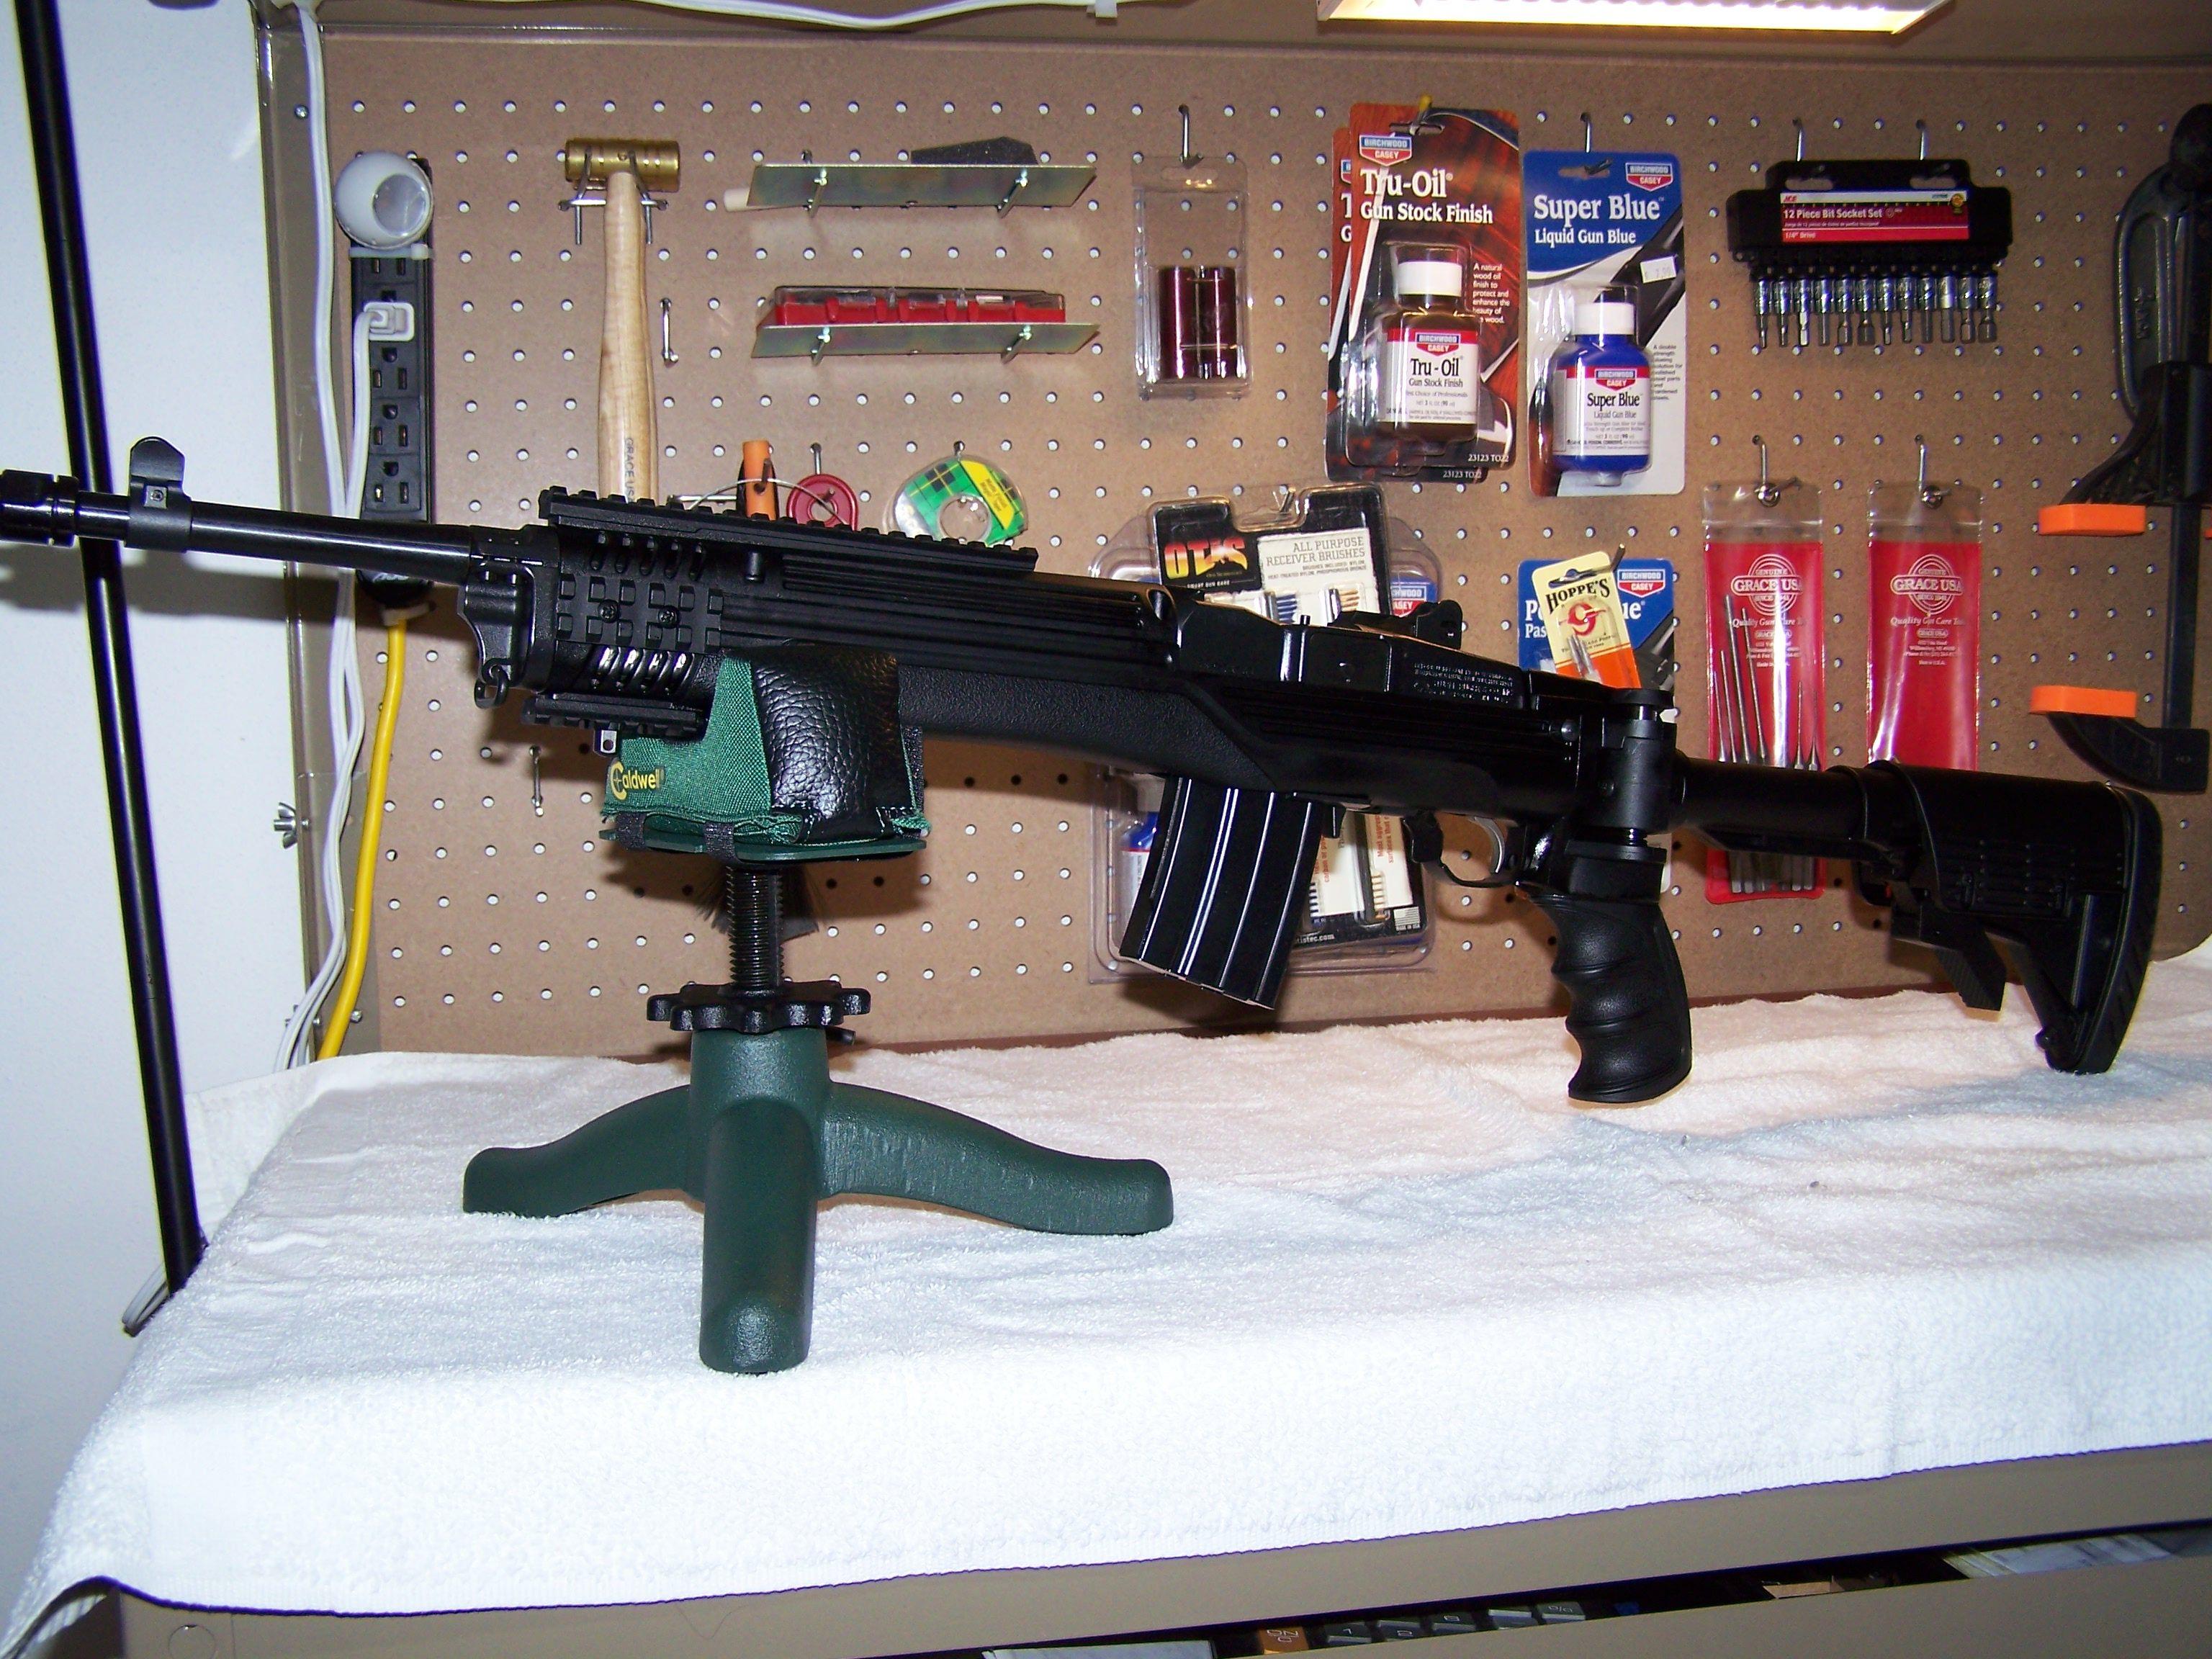 Pin on guns gotta love em